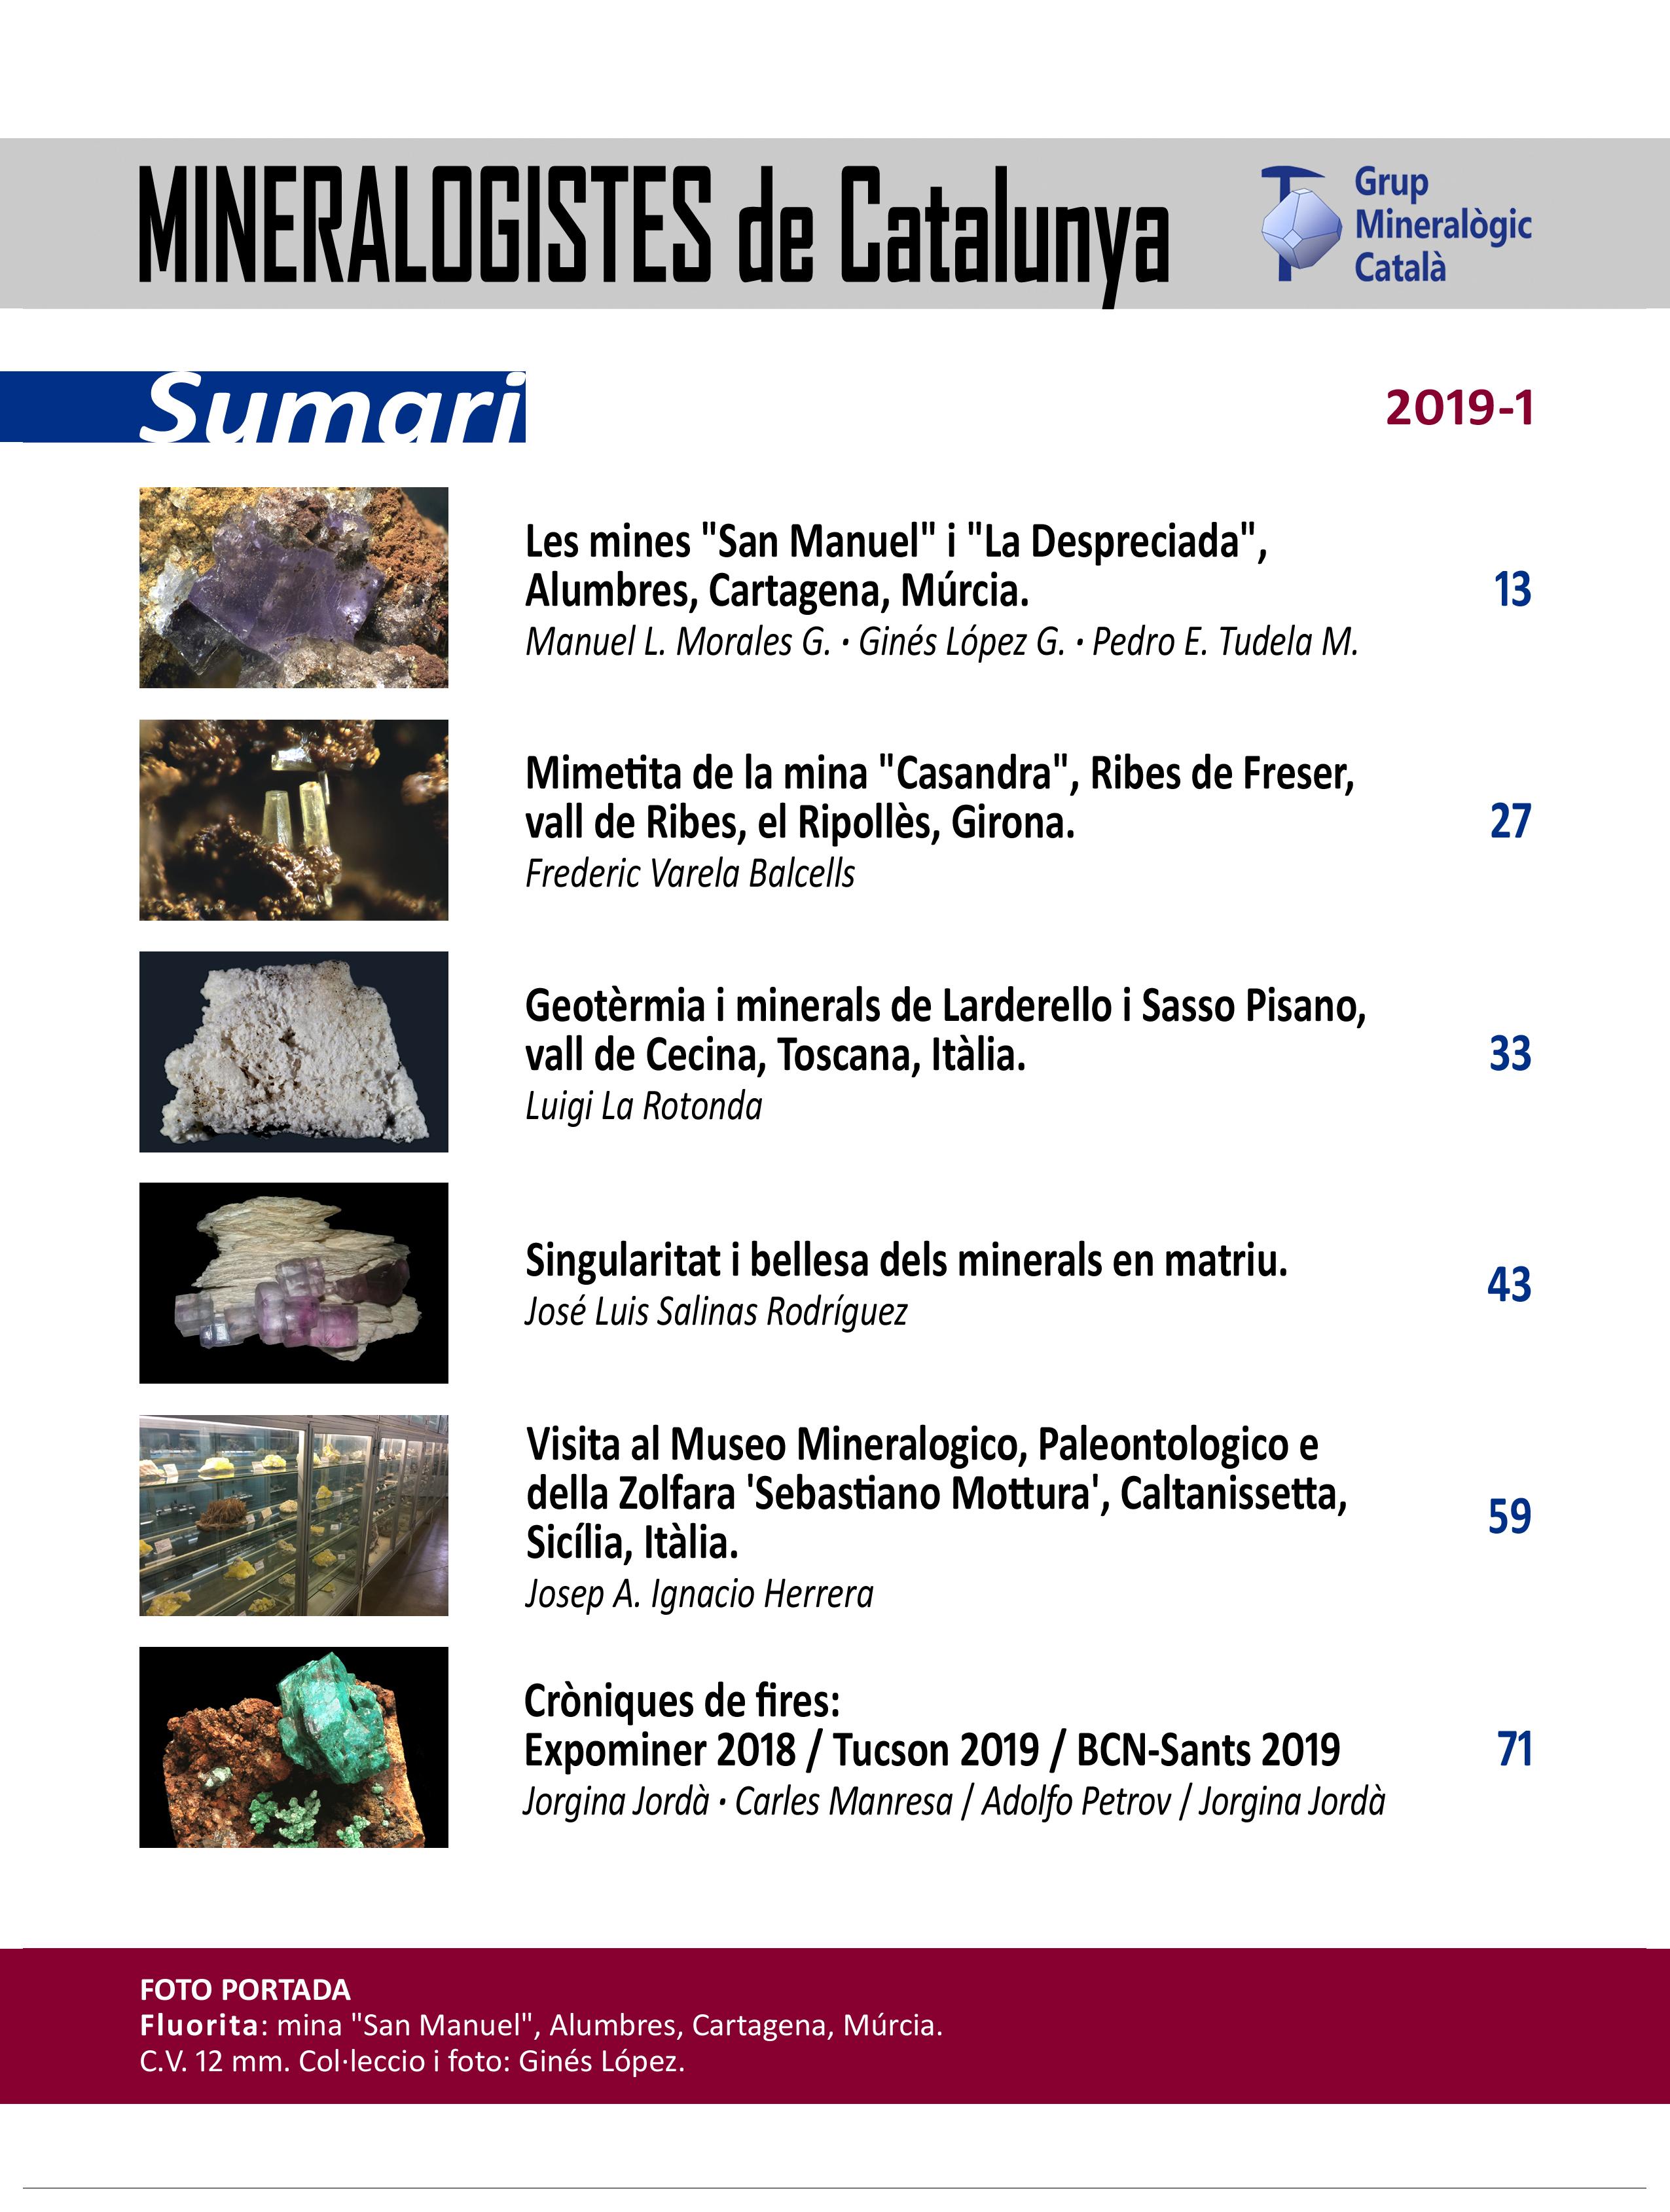 <em>Mineralogistes</em> (2019-1) - Sumari